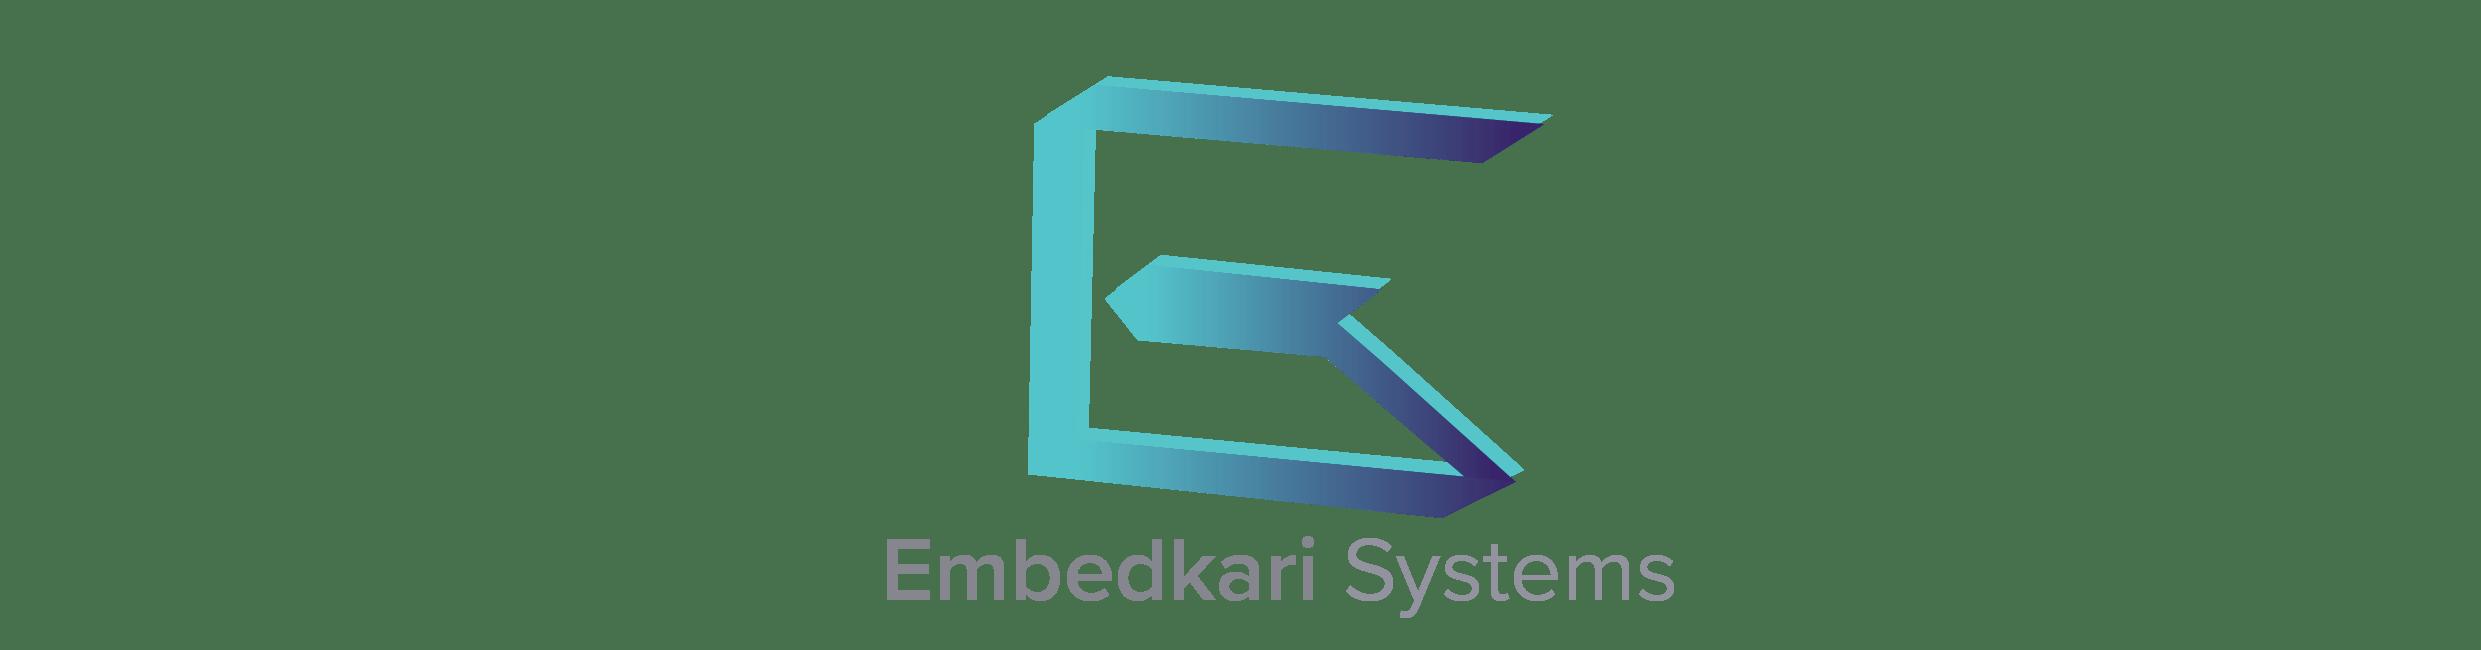 Embedkari